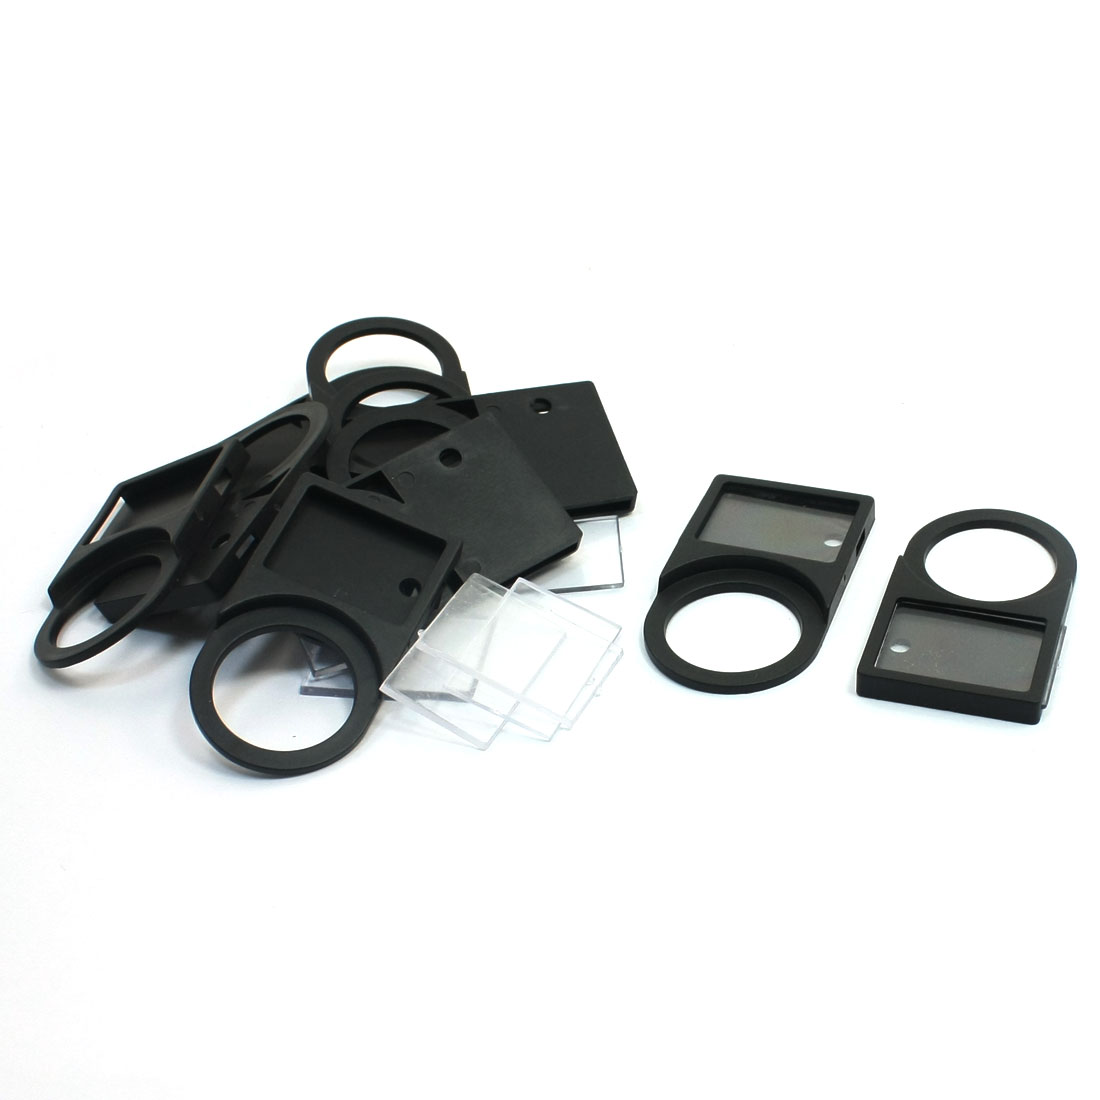 10 Pcs Black Plastic Push button Switch Panel Label Frame Holder 22mm